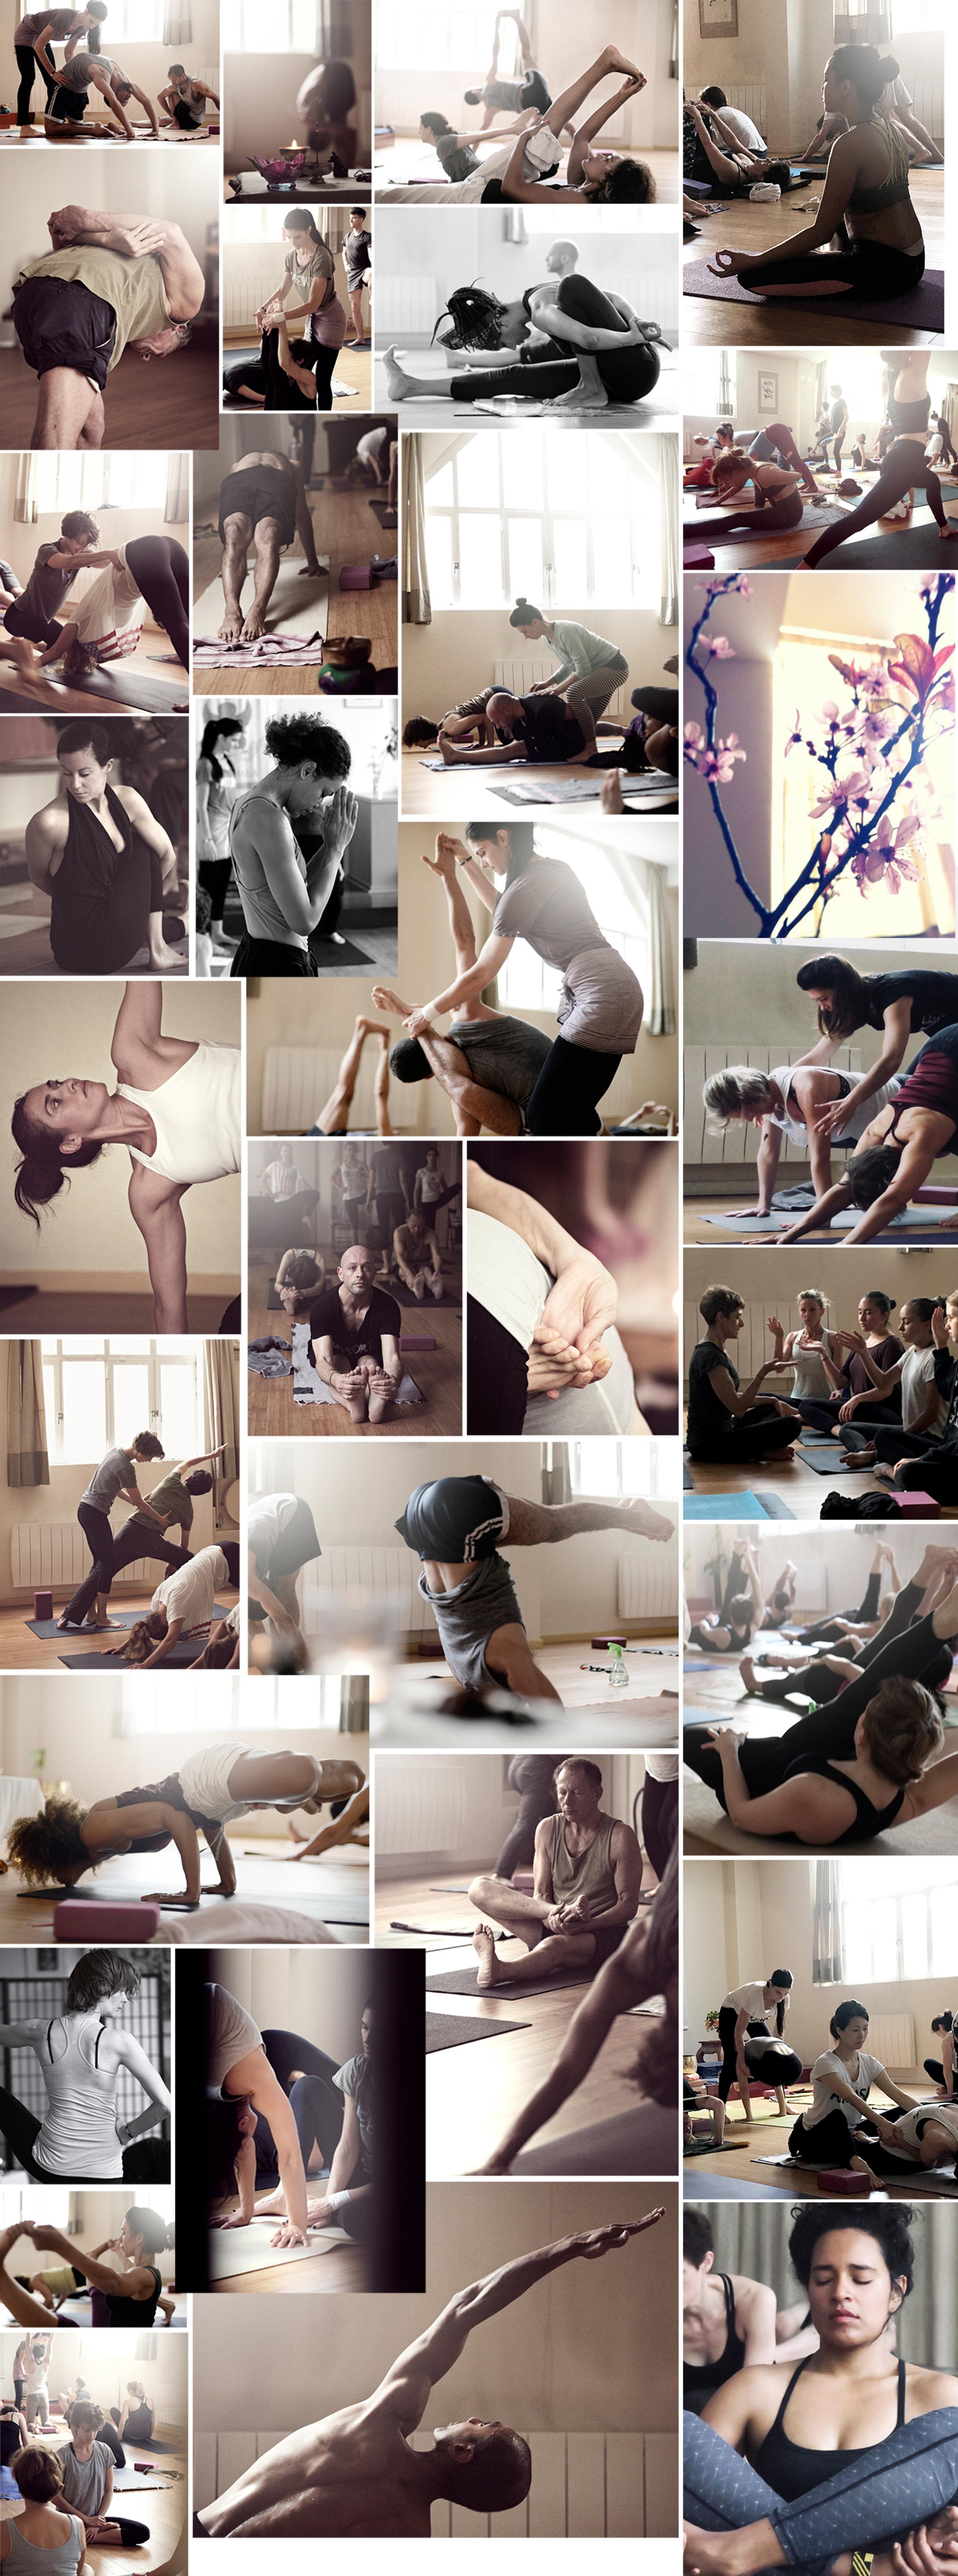 Mysore Style and Intro to Mysore at Mysore Yoga Paris Ashtanga Yoga Studio in Paris 11e